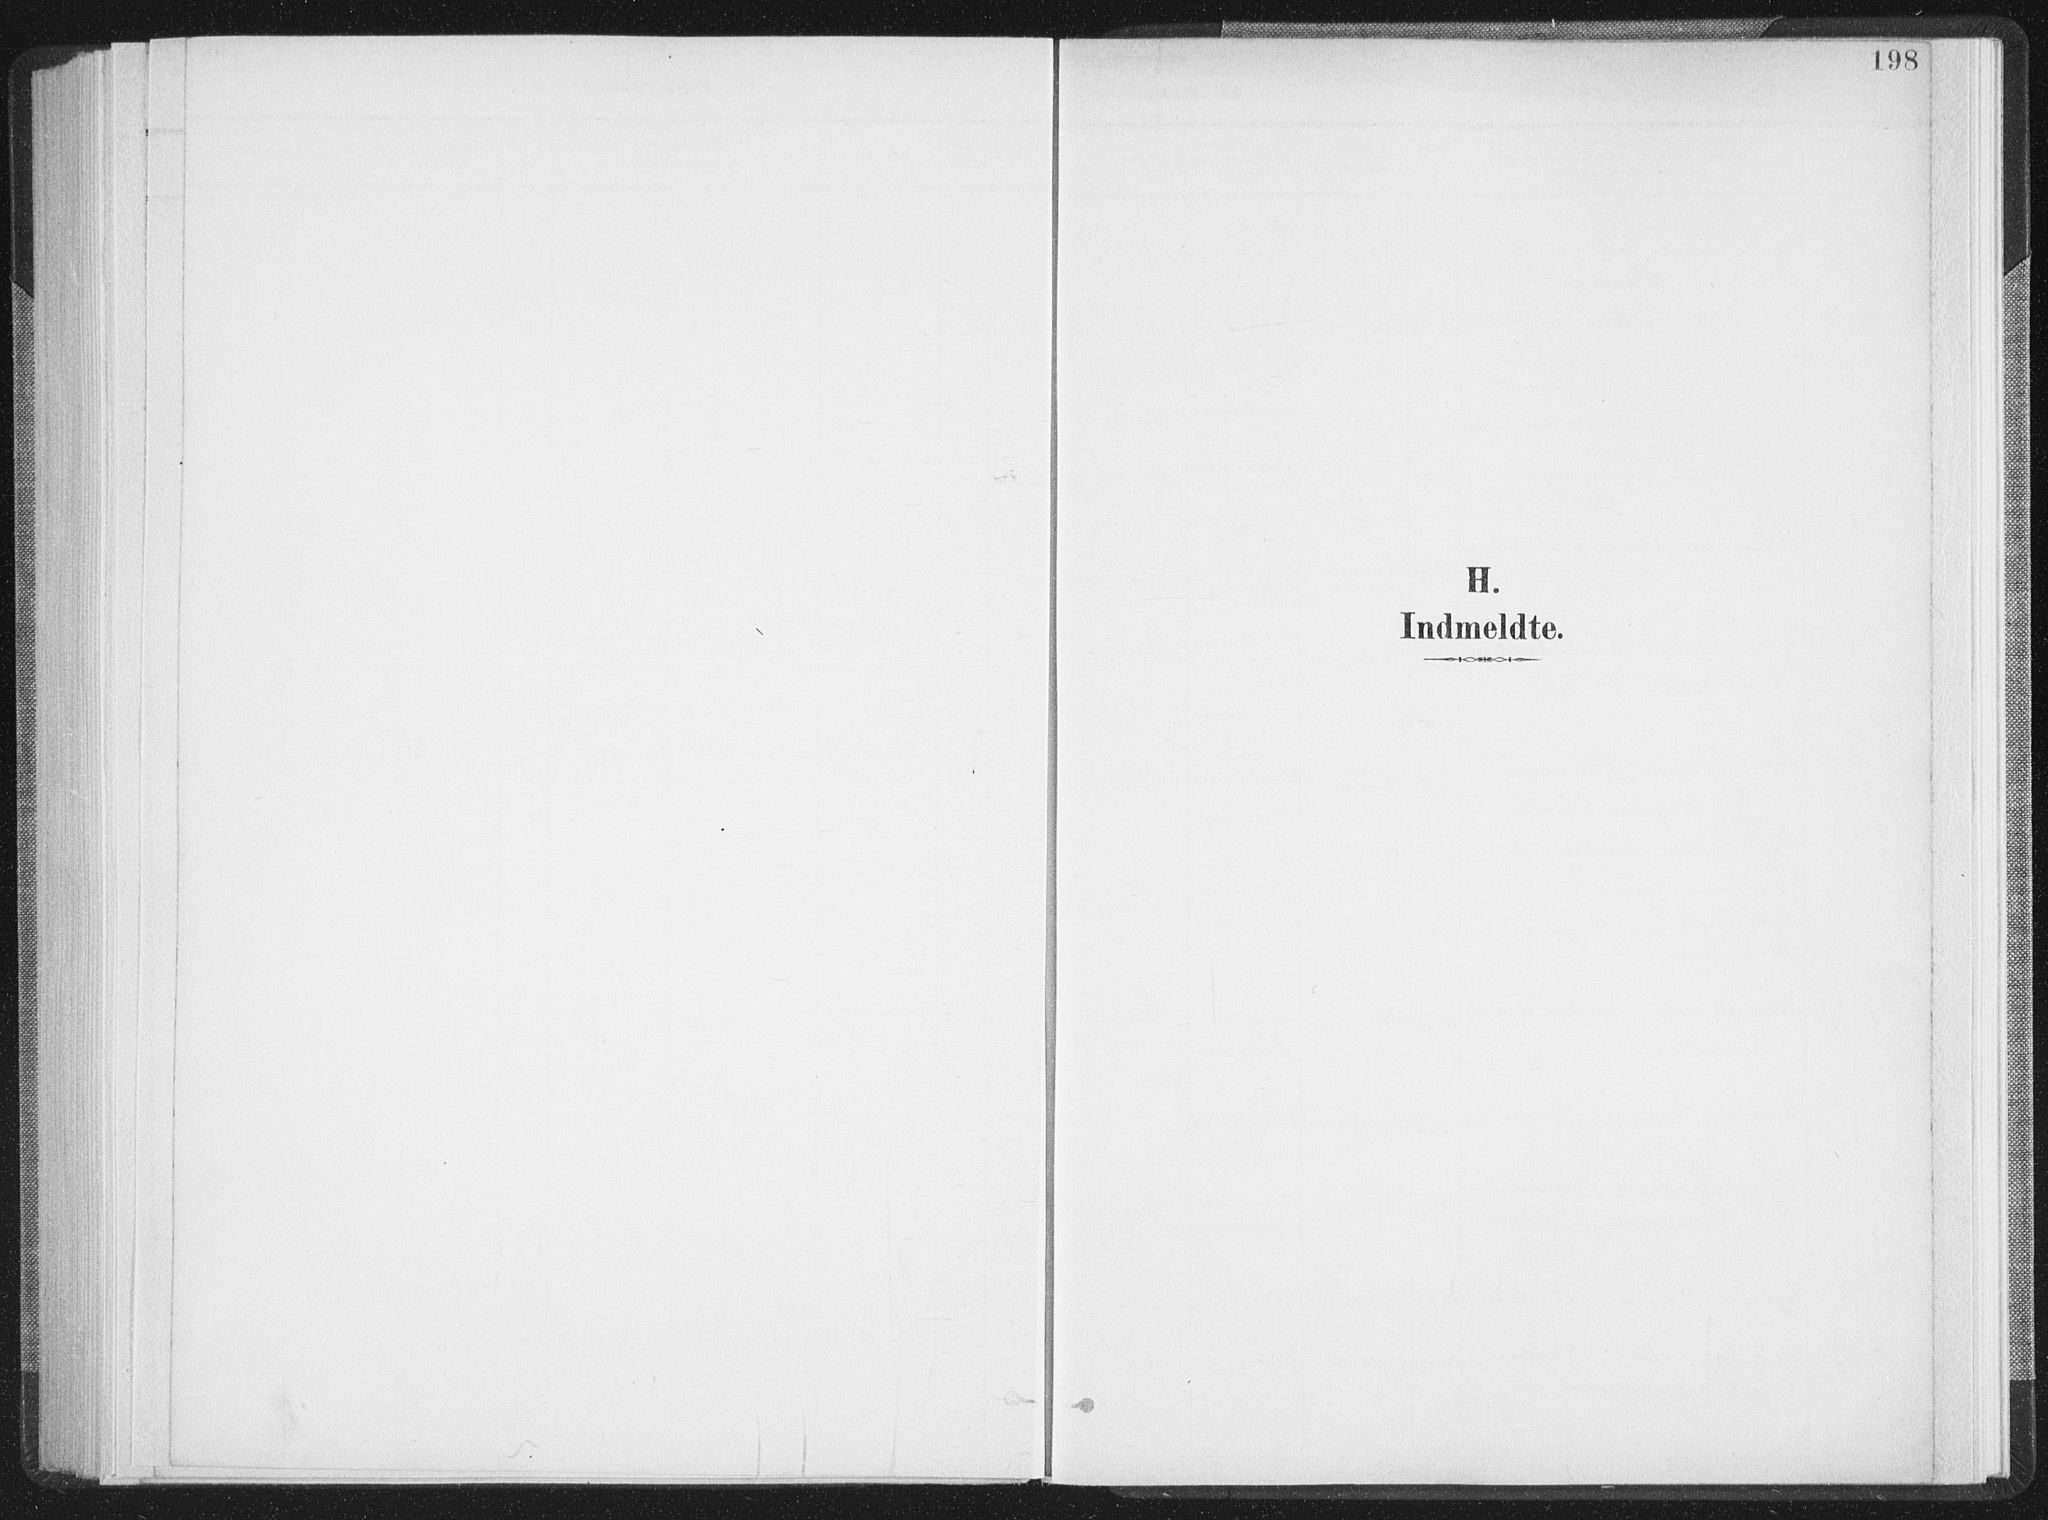 SAT, Ministerialprotokoller, klokkerbøker og fødselsregistre - Nordland, 897/L1400: Ministerialbok nr. 897A07, 1897-1908, s. 198